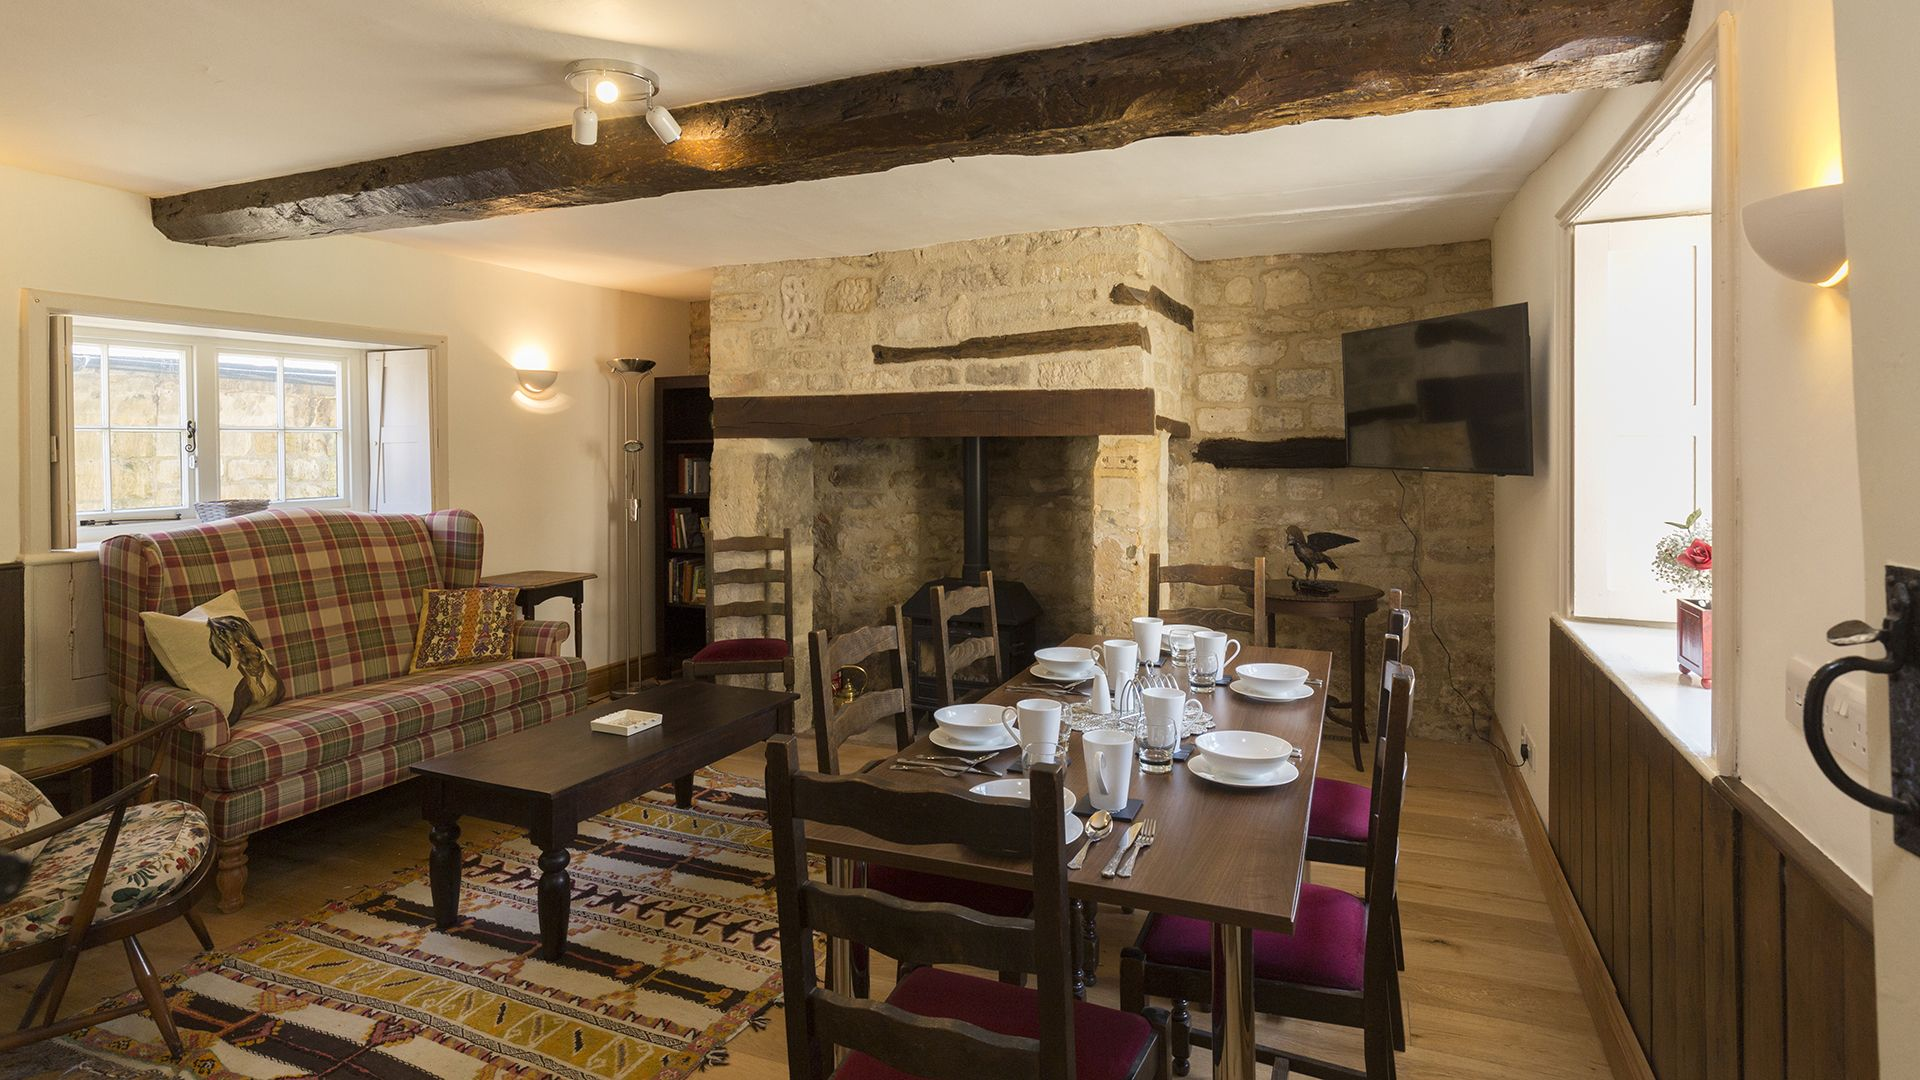 Snug/Breakfast room, Almsbury Farmhouse at Sudeley Castle, Bolthole Retreats